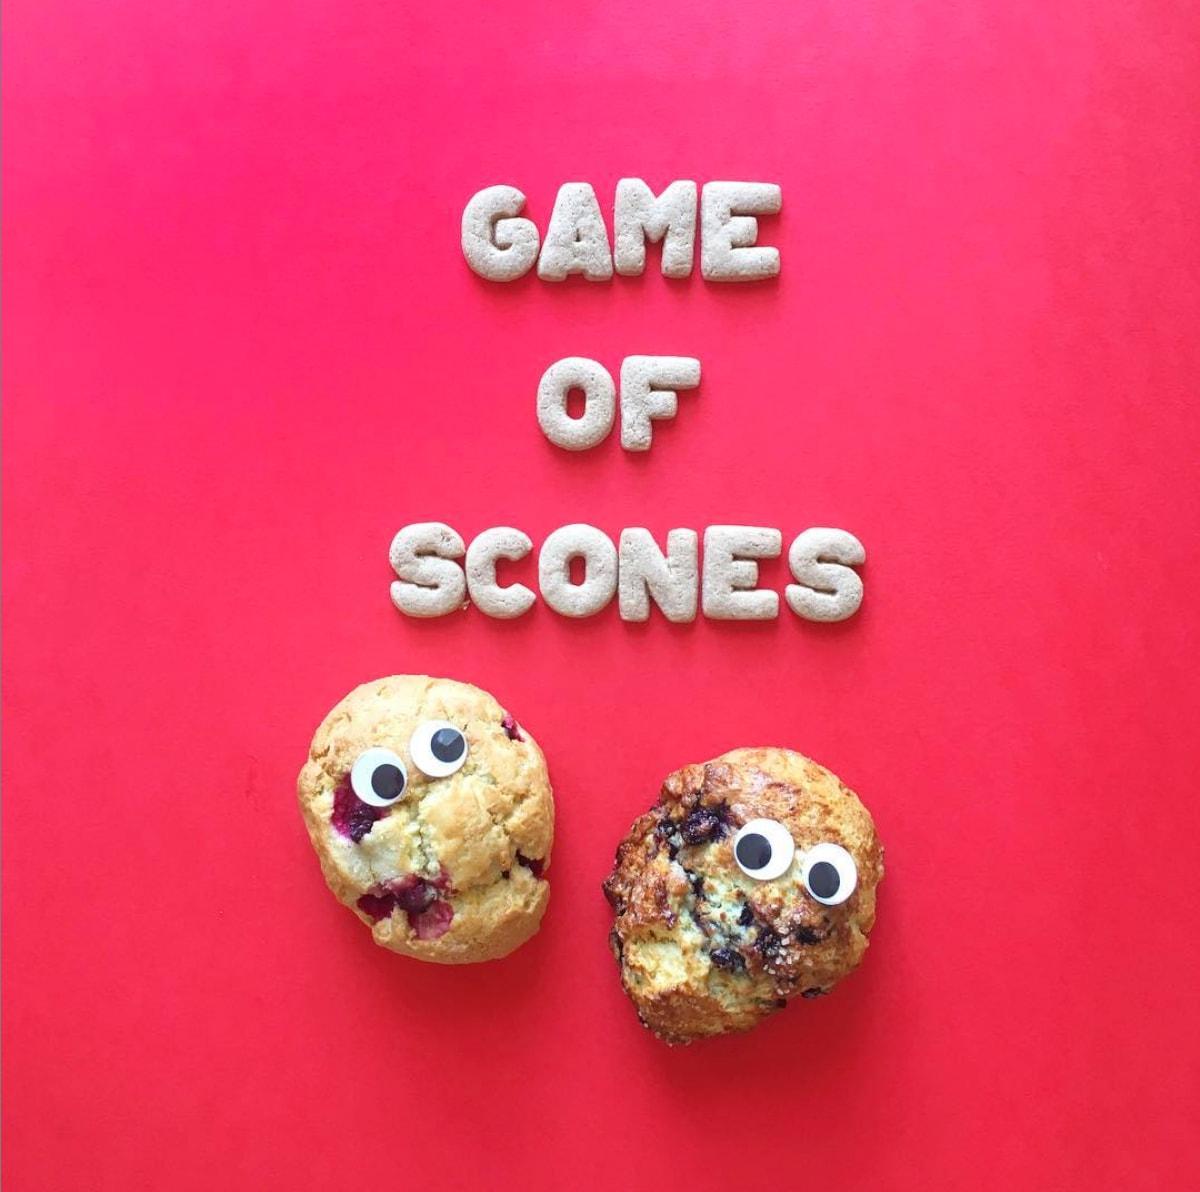 Cake Puns - Game of Scones